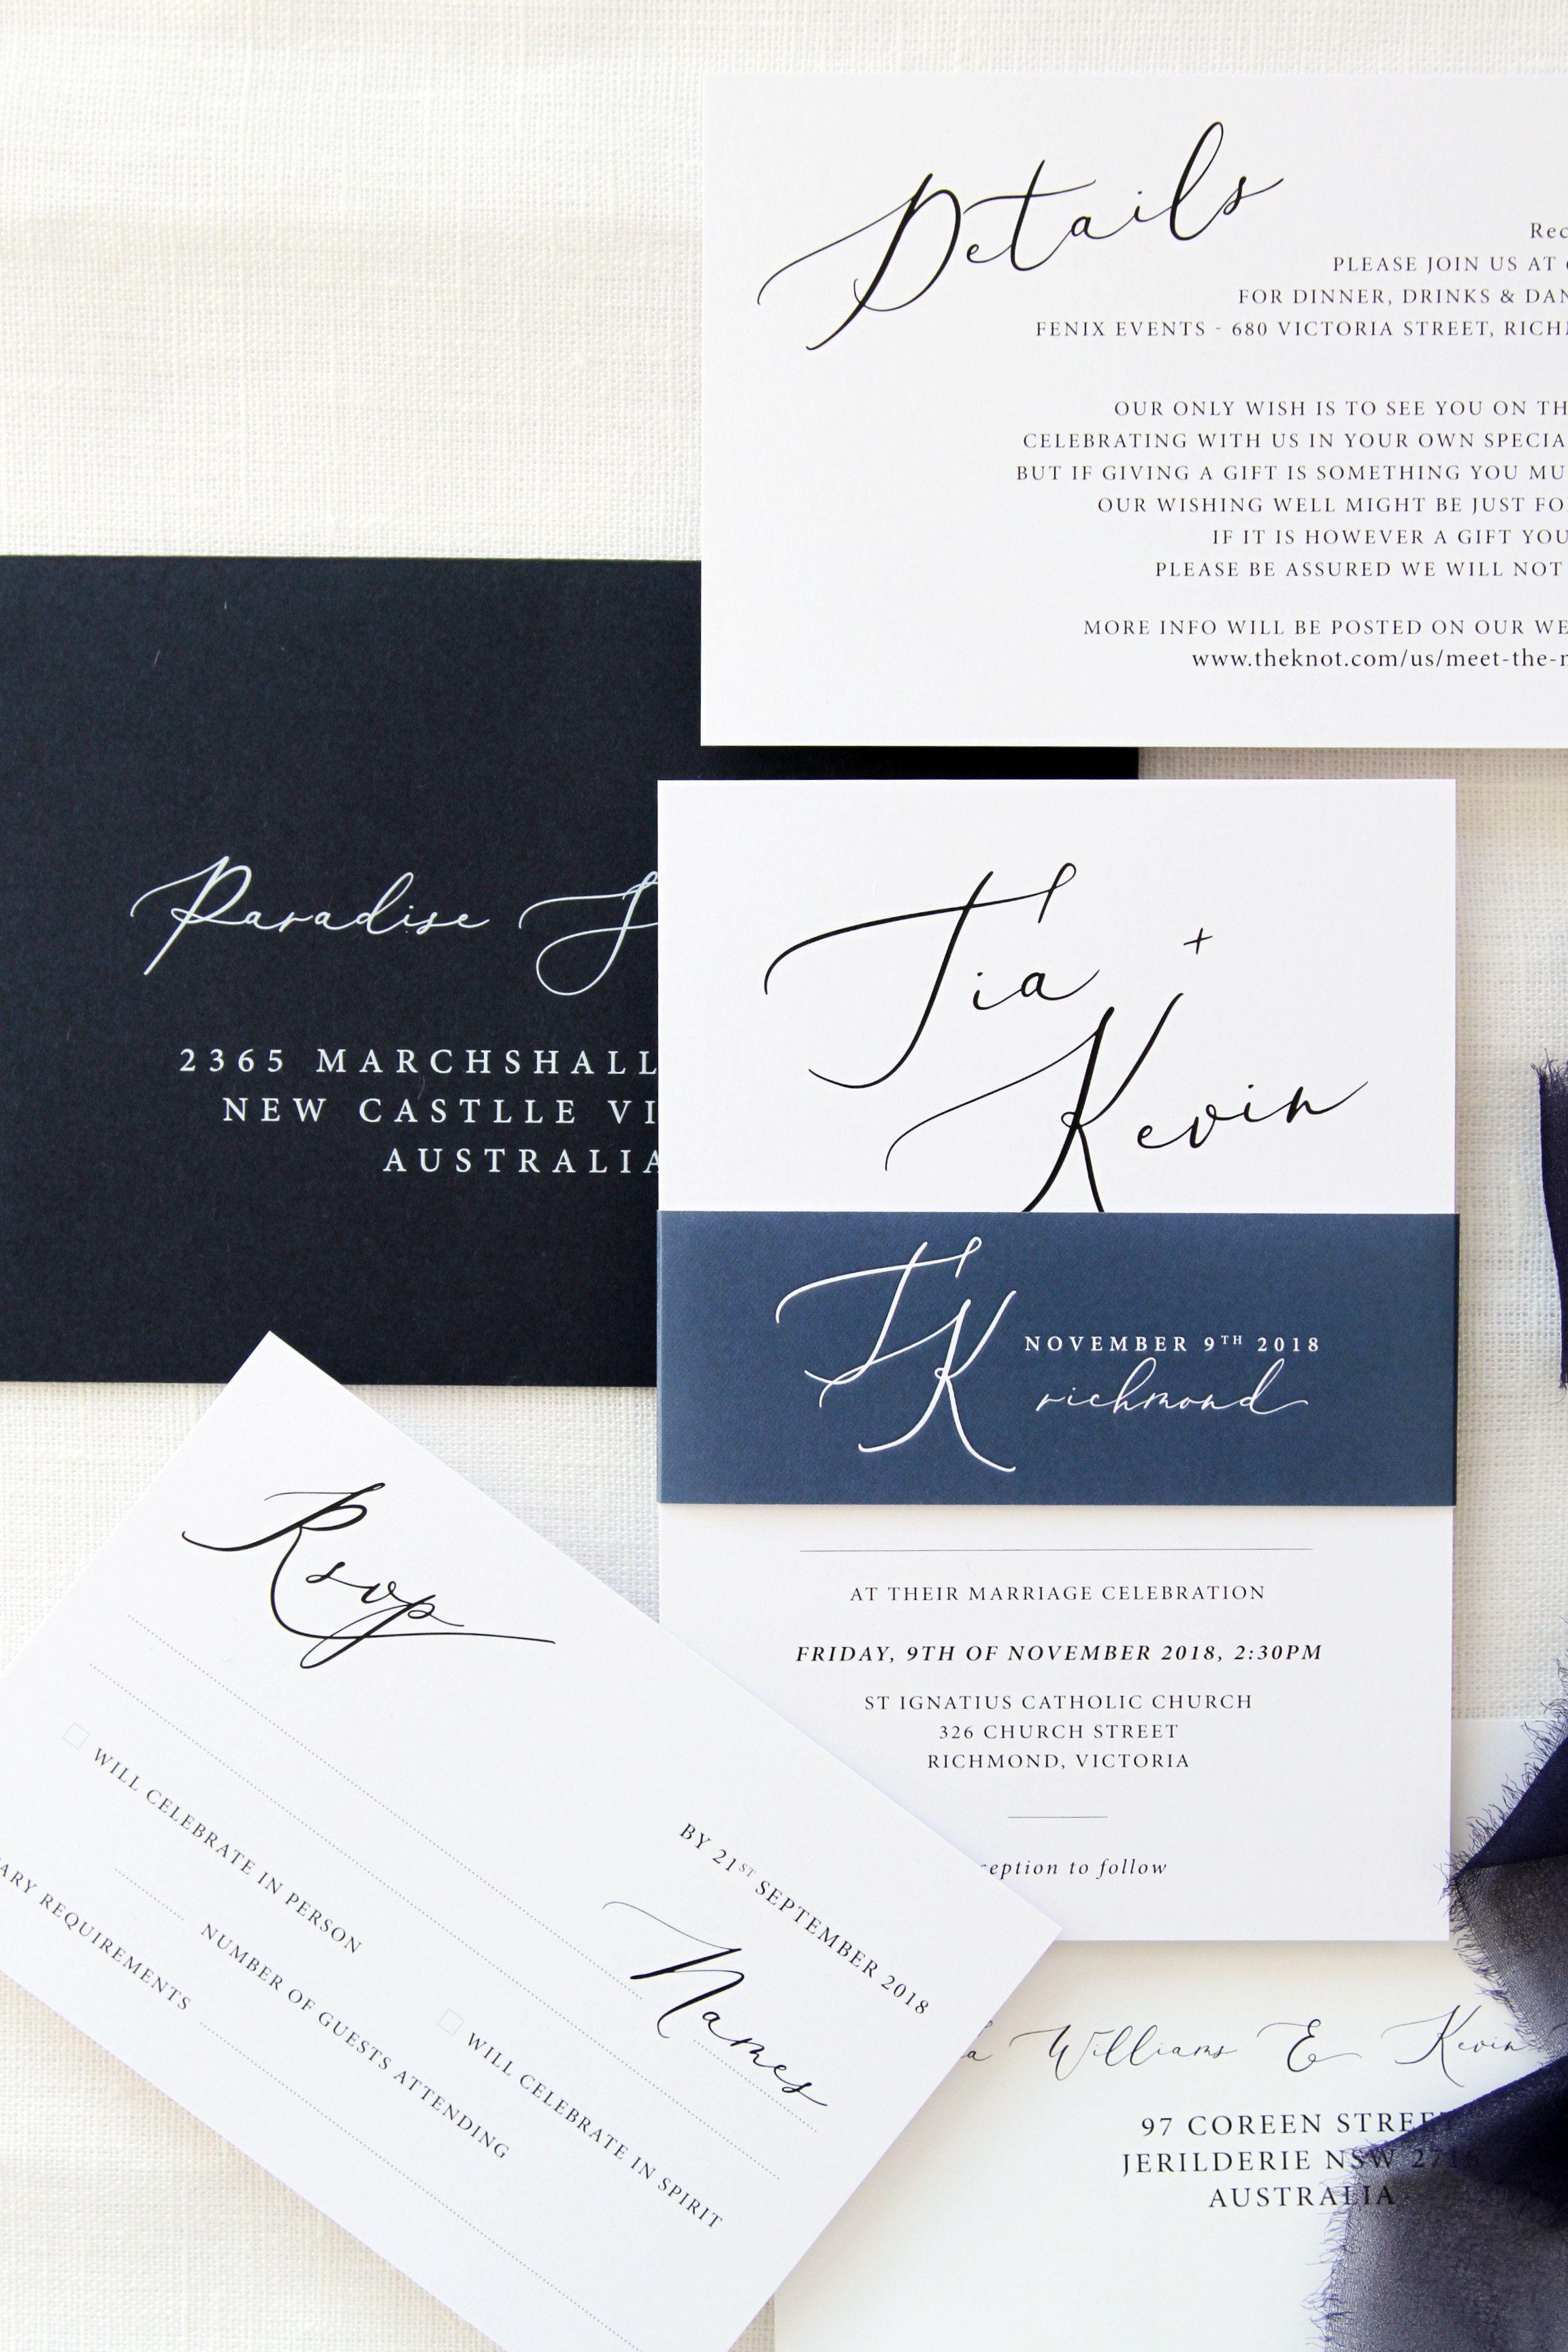 Weddinginvitations Weddingstationary Navyblue Calligraphy Beautiful Classy Elegant Invitations Savethedate Envelope Liners Invitation Set Invitations